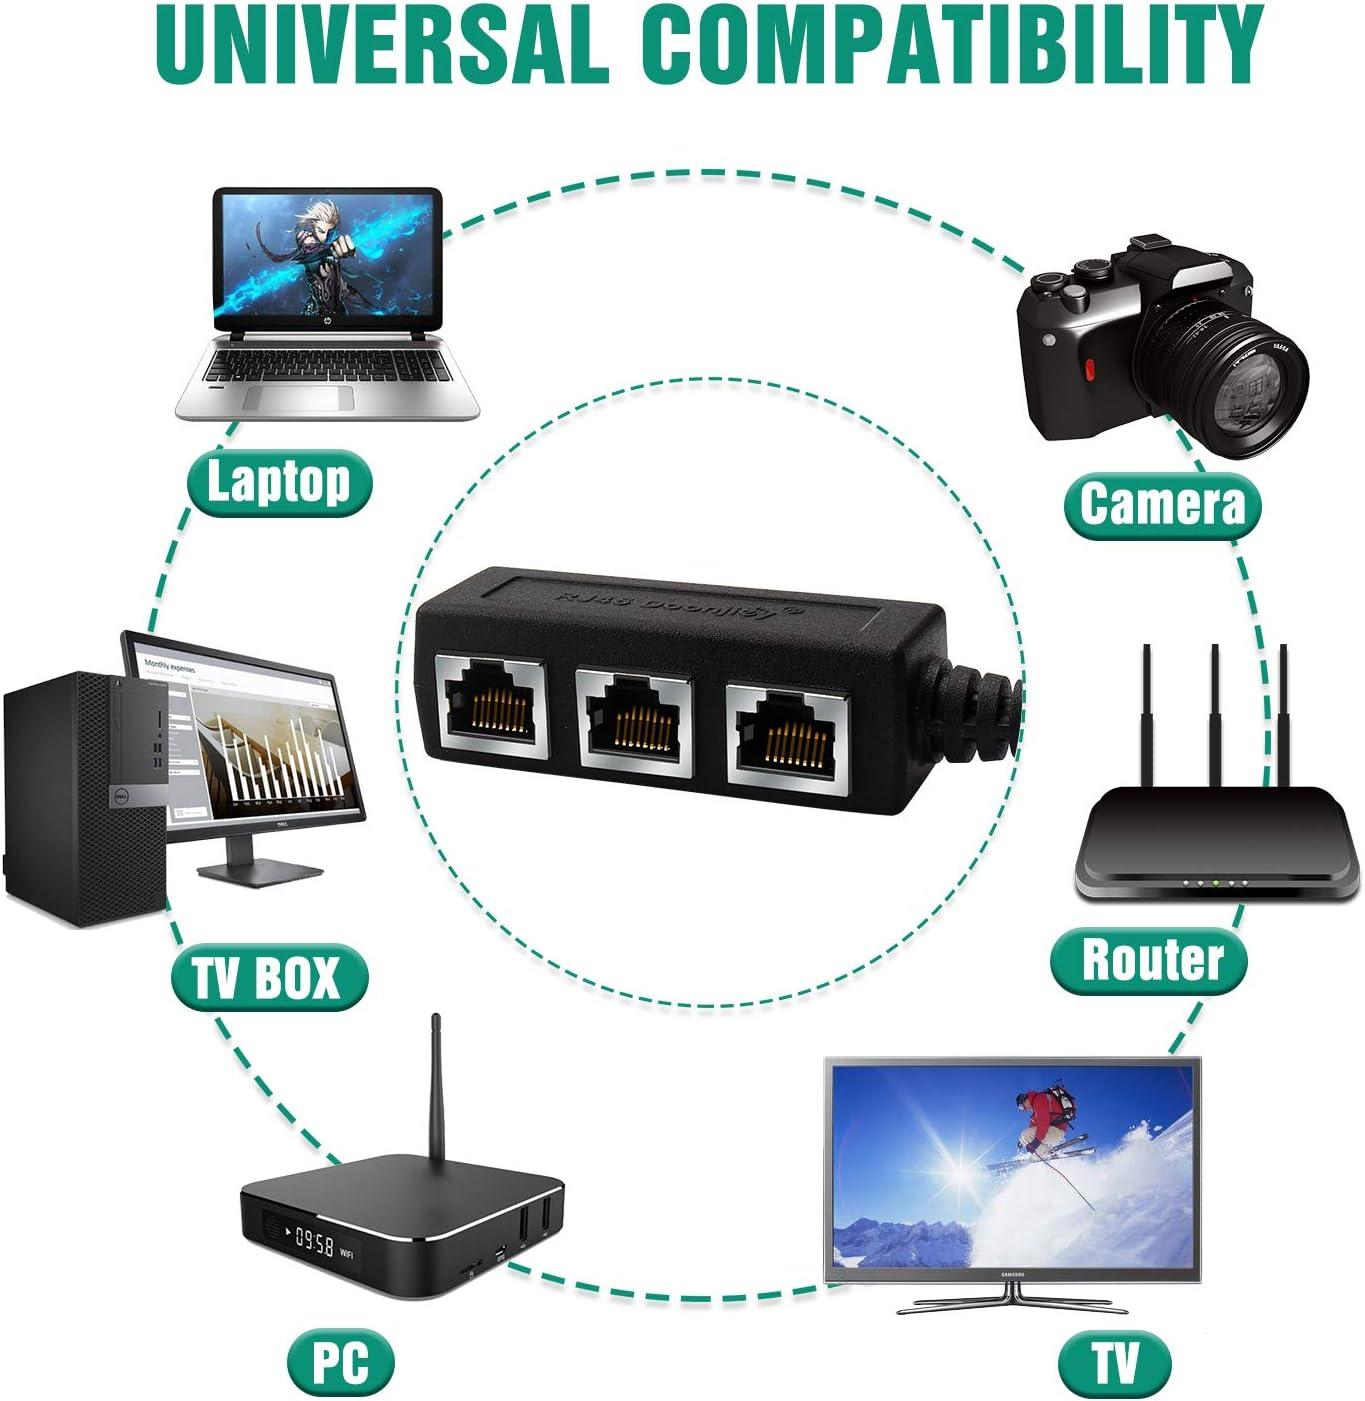 RJ45 3-Port Splitter Adapter,Trunple RJ45 1 Male to 3 Female LAN Ethernet Splitter Cable Cat7 Compatible with Cat5e Cat6 Black